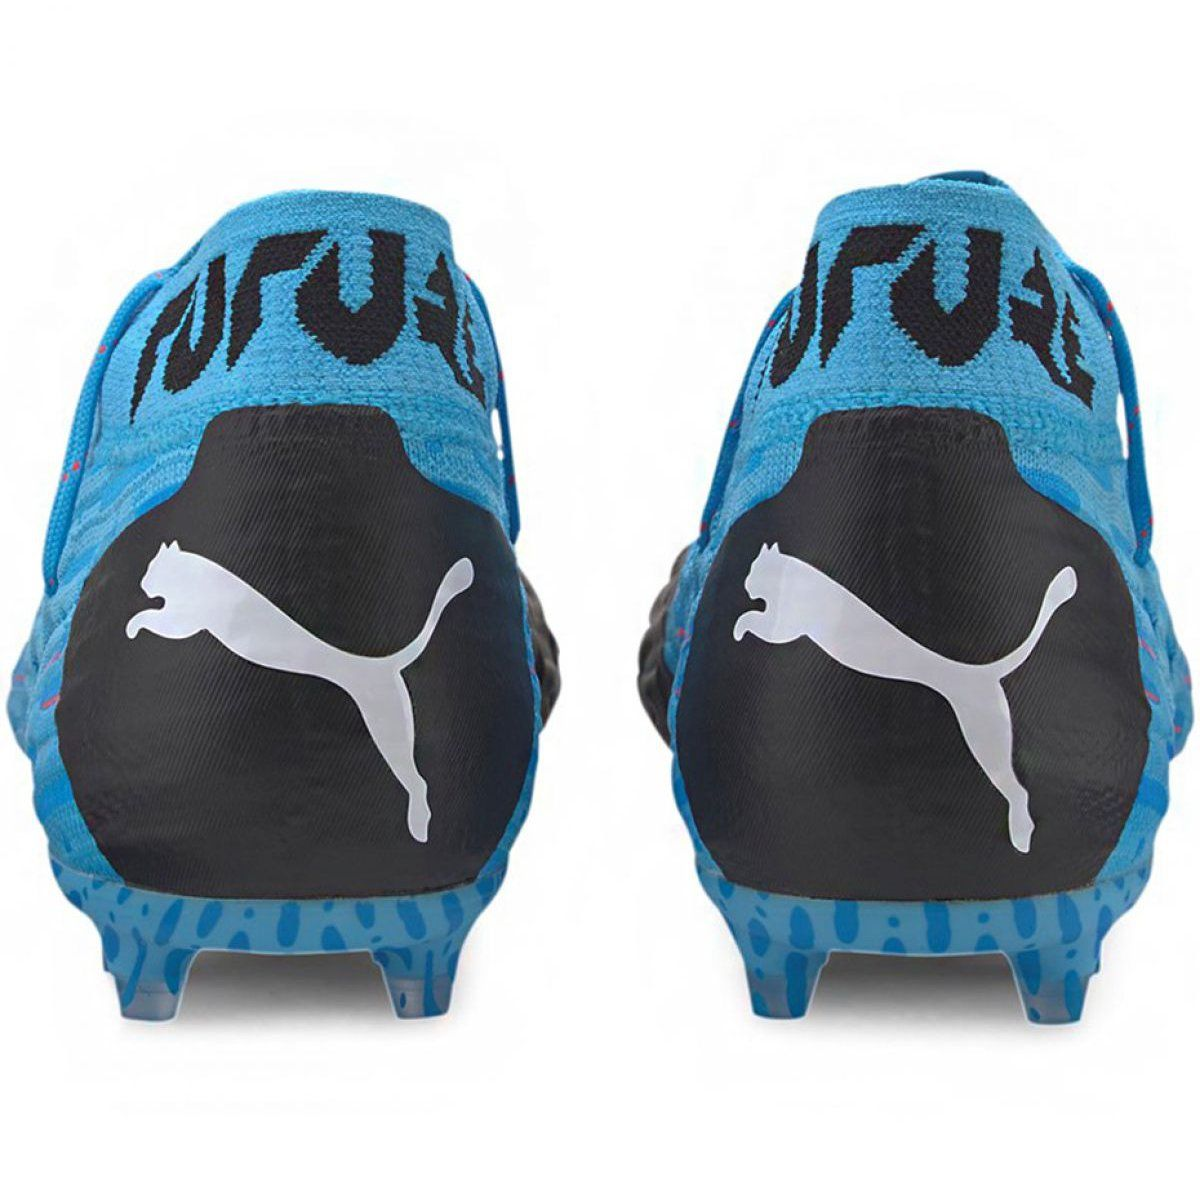 Buty Pilkarskie Puma Future 5 1 Netfit Fg Ag M 105755 01 Niebieskie Niebieskie Mens Football Boots Football Boots Football Shoes